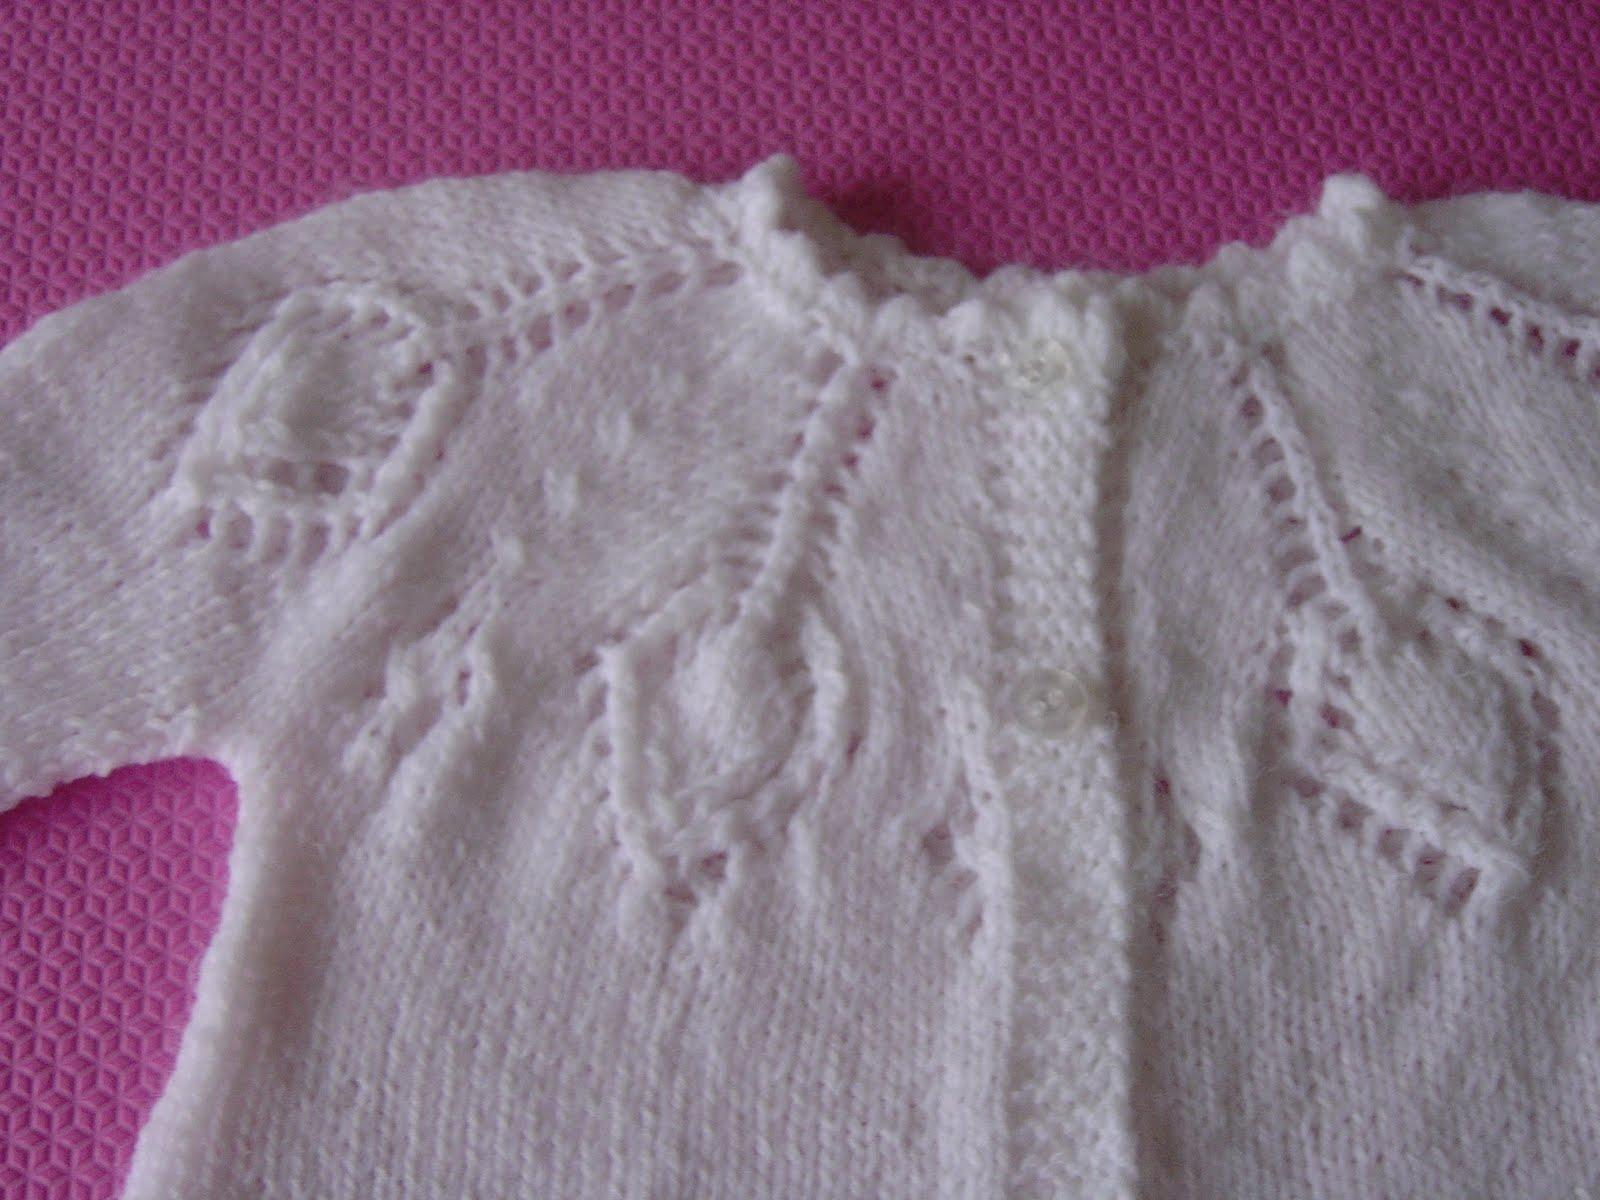 Enthusiastic crochetoholic: I Love Patons Vintage Knitting Patterns